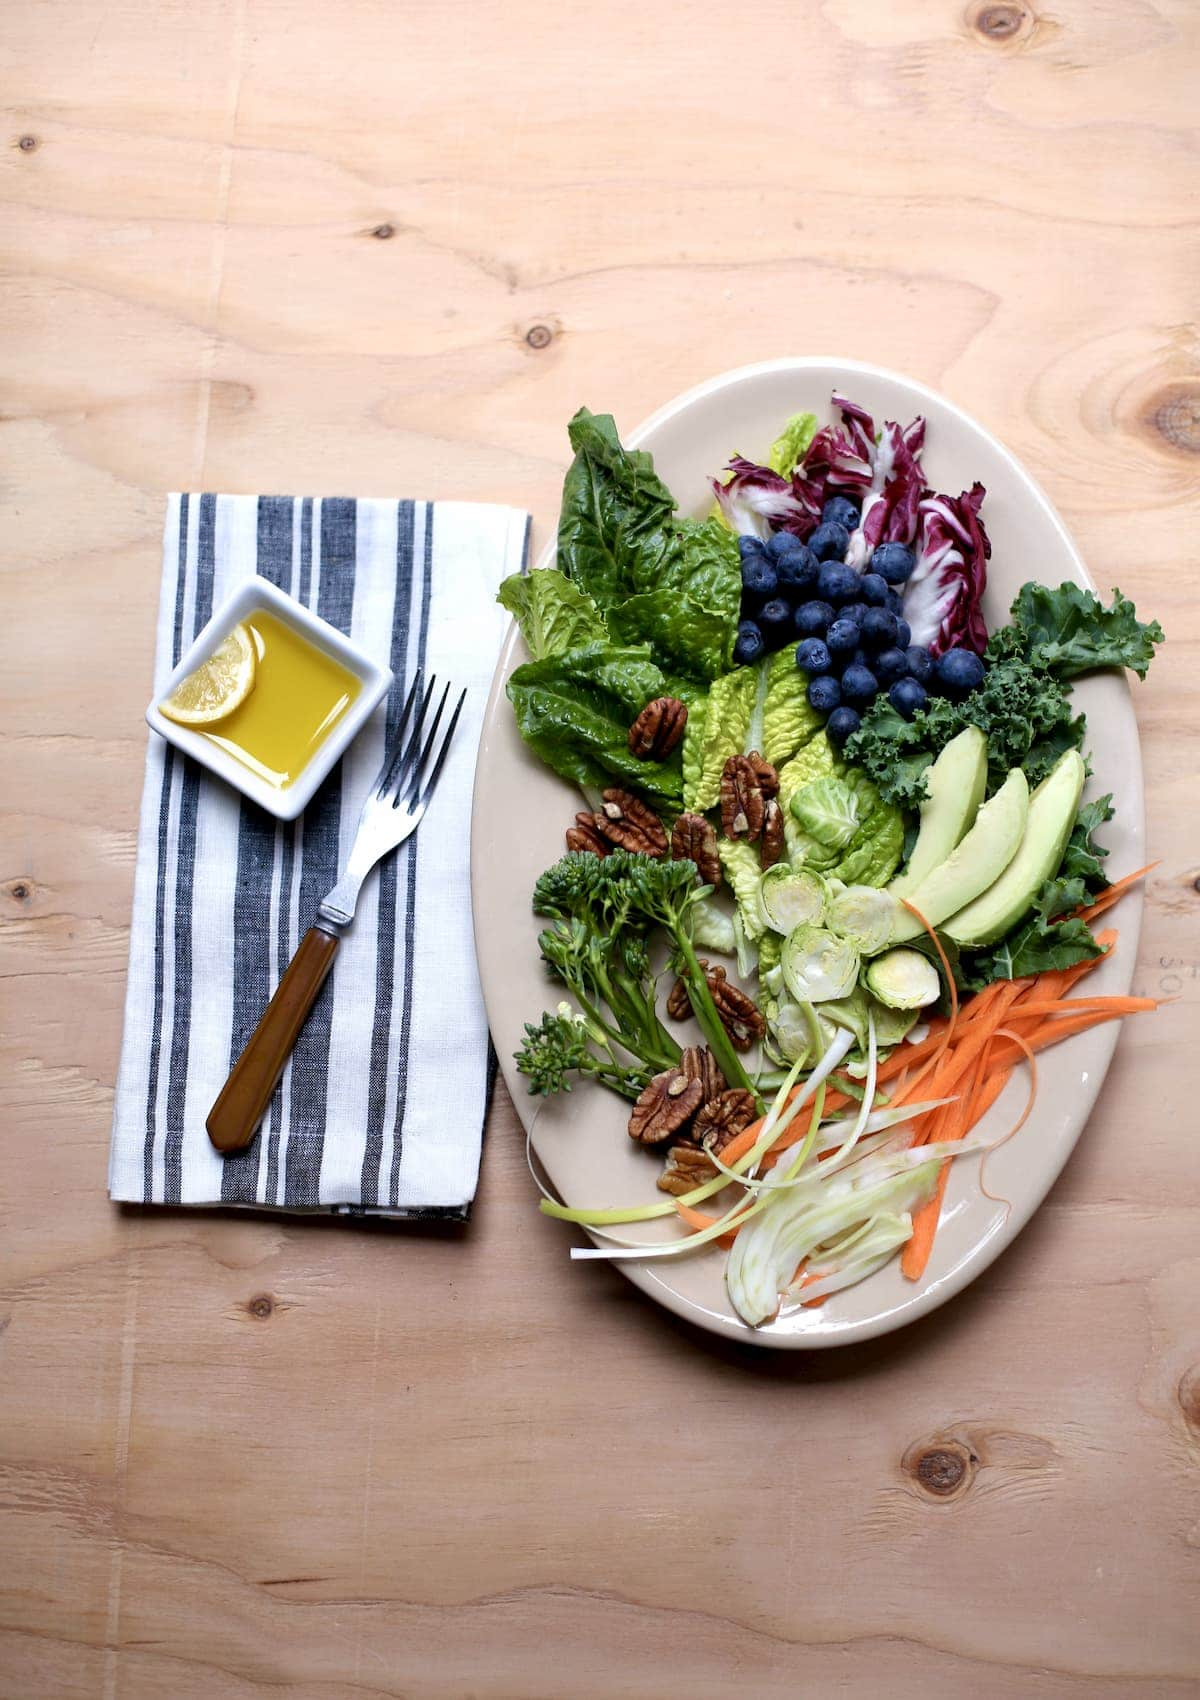 a large white platter of salad with a fork and lemon dressing alongside.